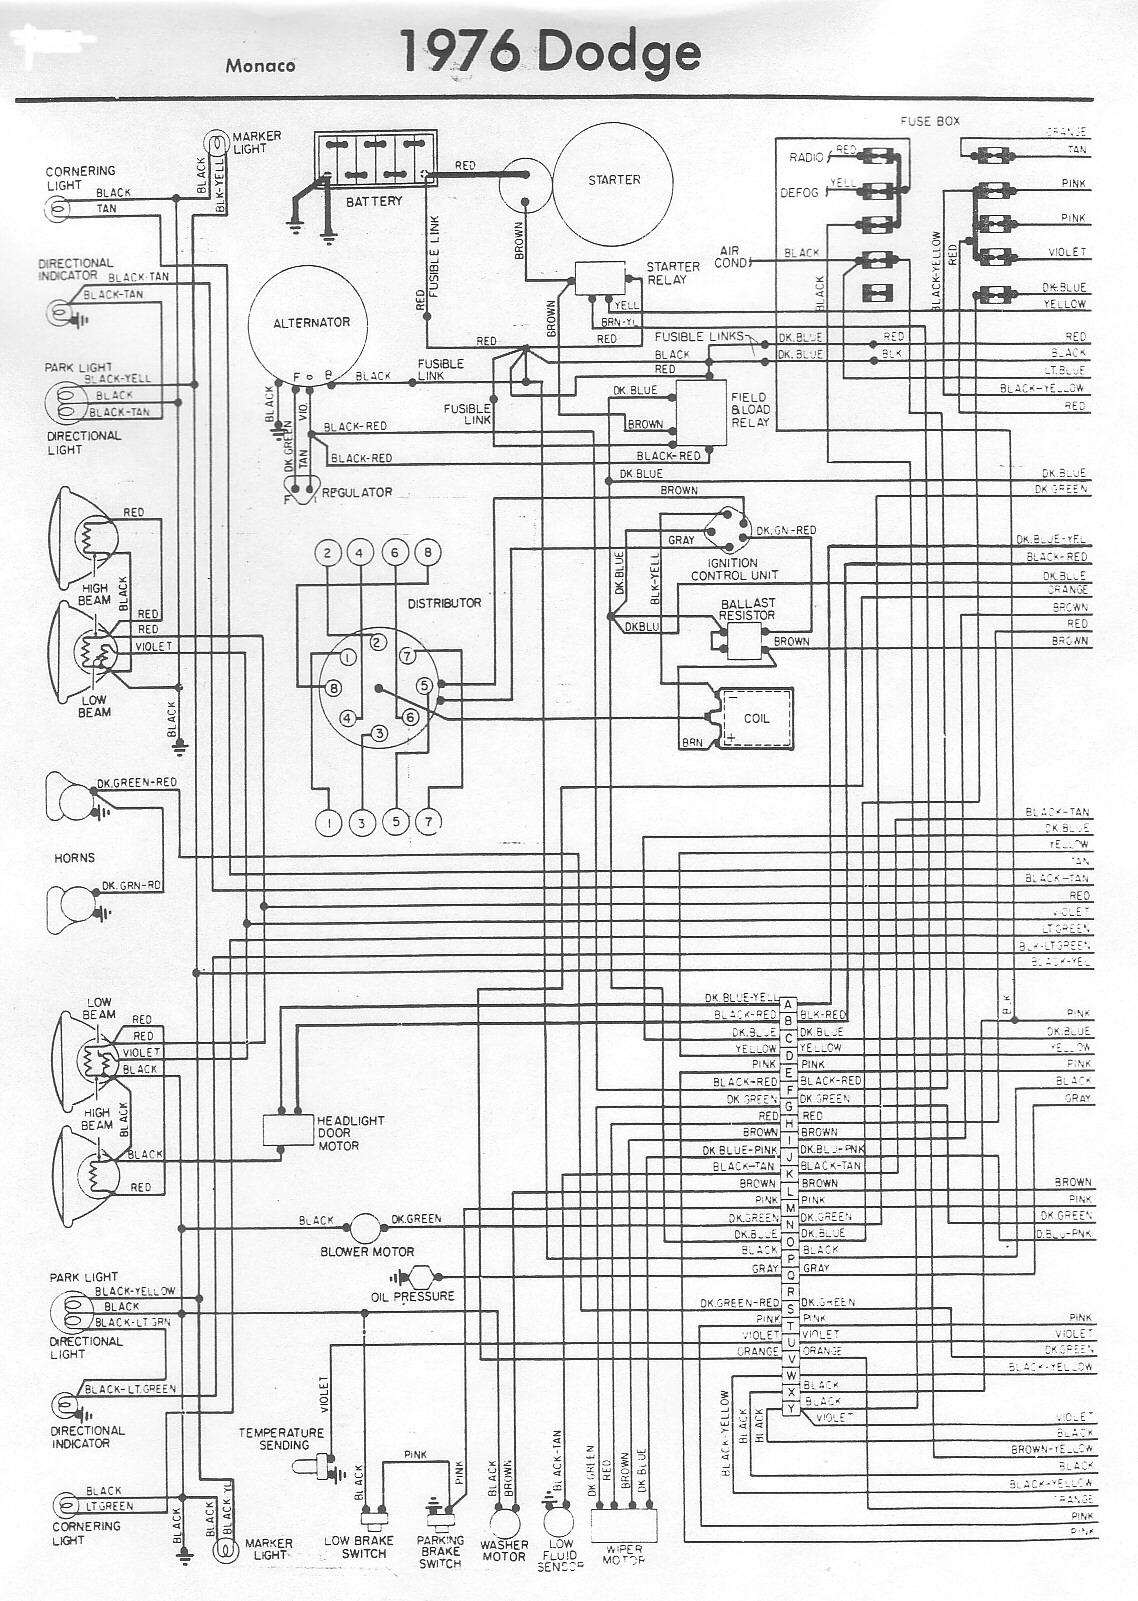 Marvelous Dodge Rv Wiring Diagram Wiring Diagram Wiring Cloud Hisonuggs Outletorg